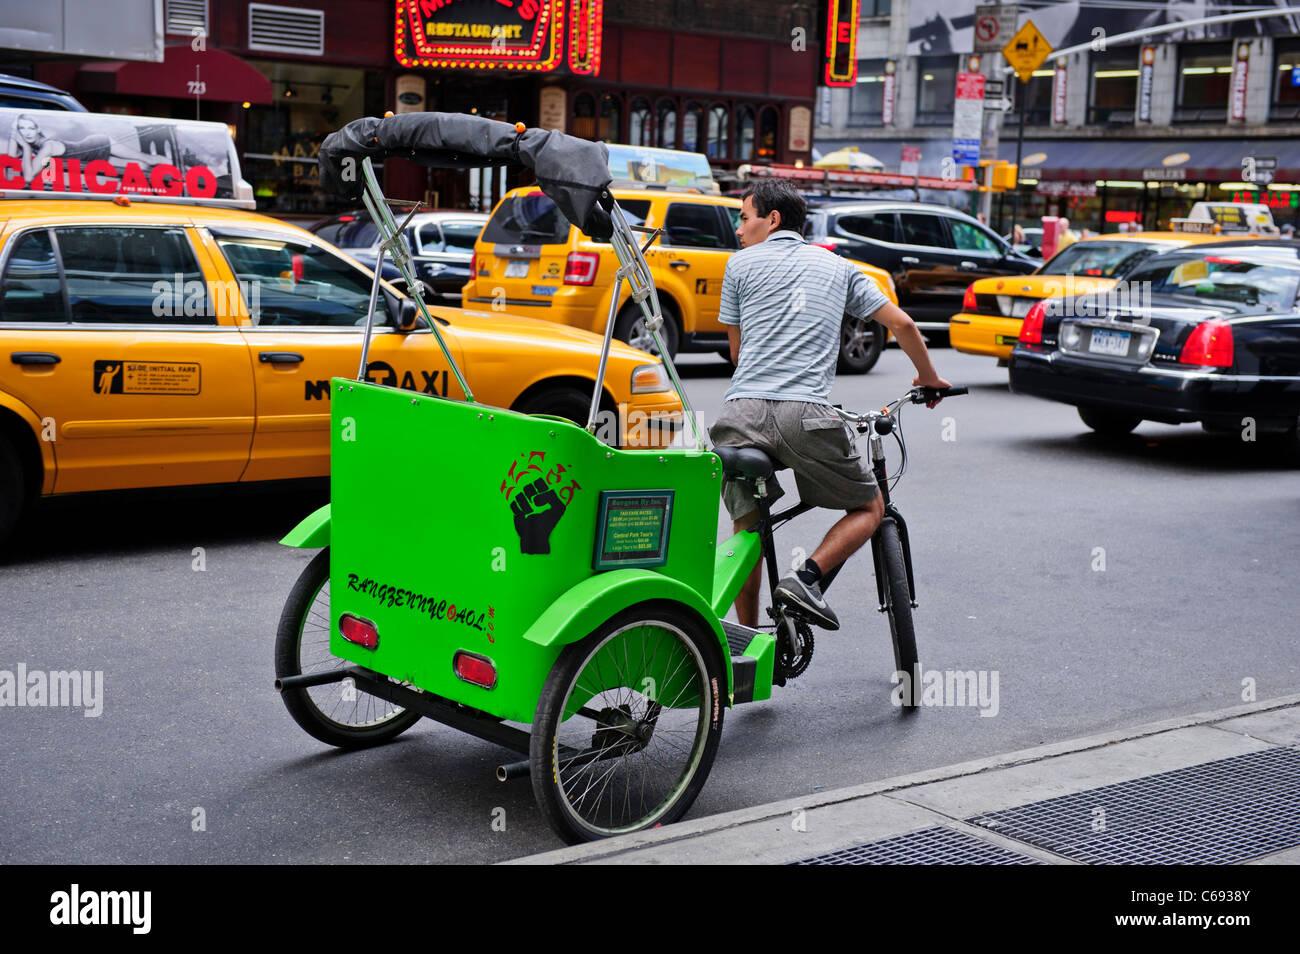 Rikscha, Times Square, New York City, USA. Stockbild